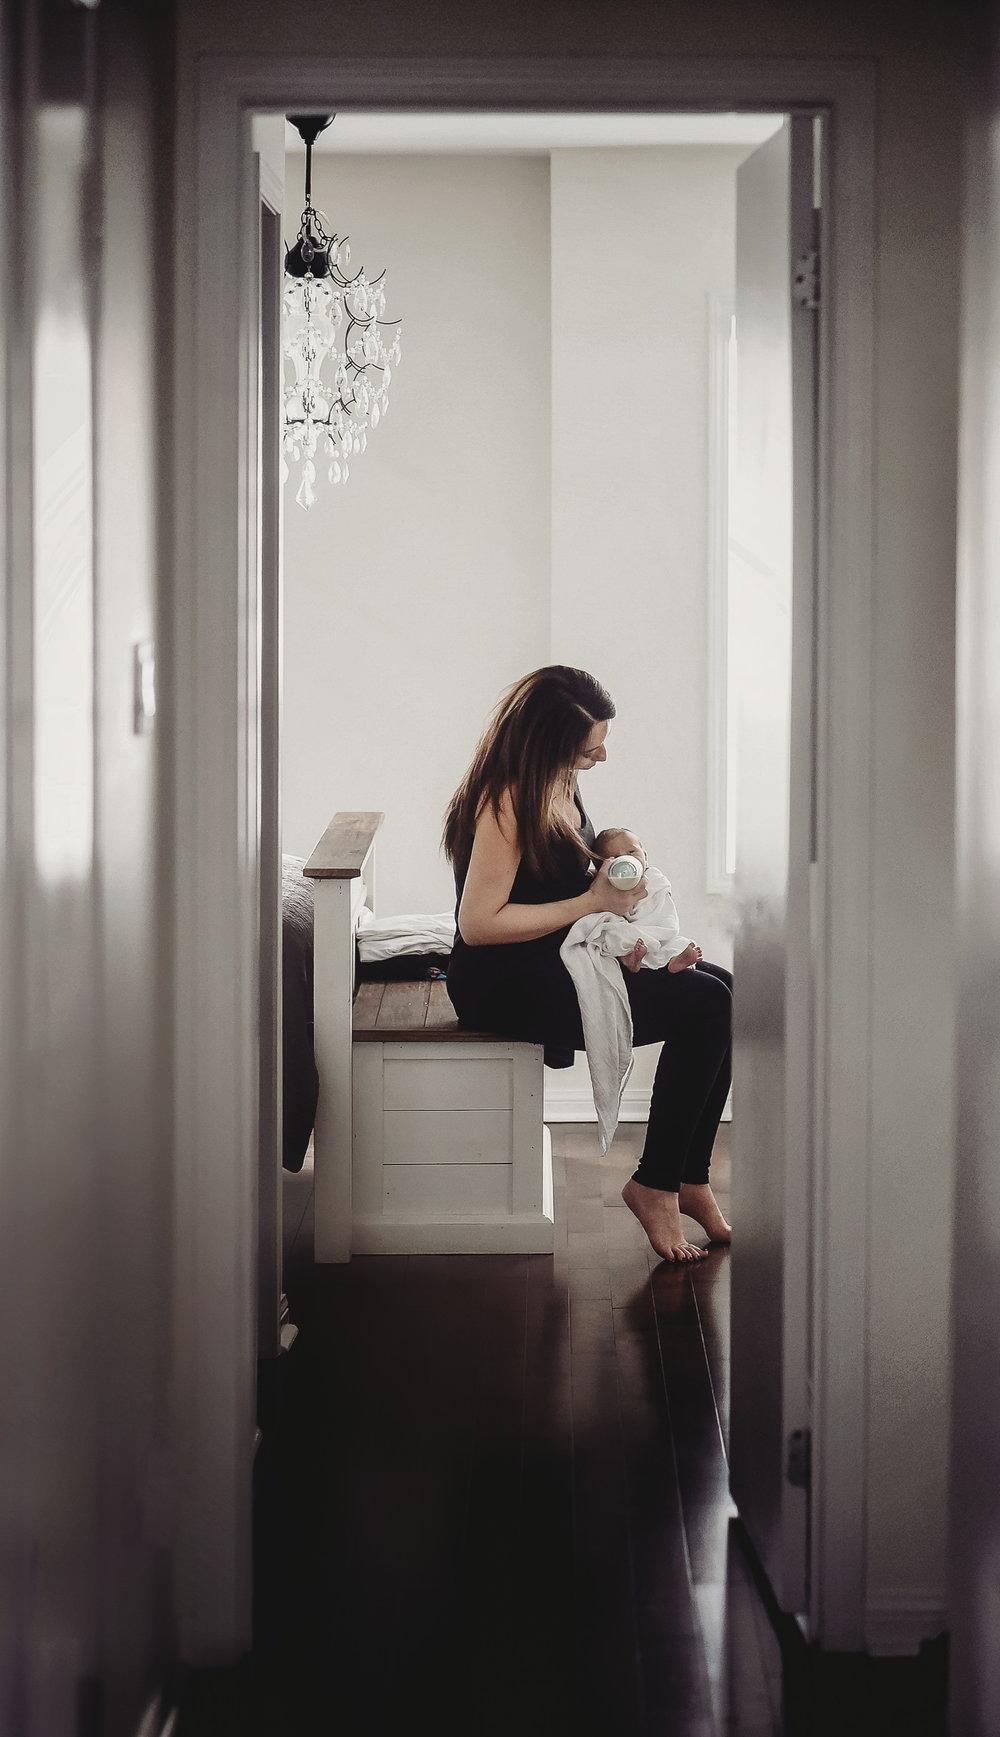 Professional Photographer - Toronto, Canada - Ranna Asha Photography